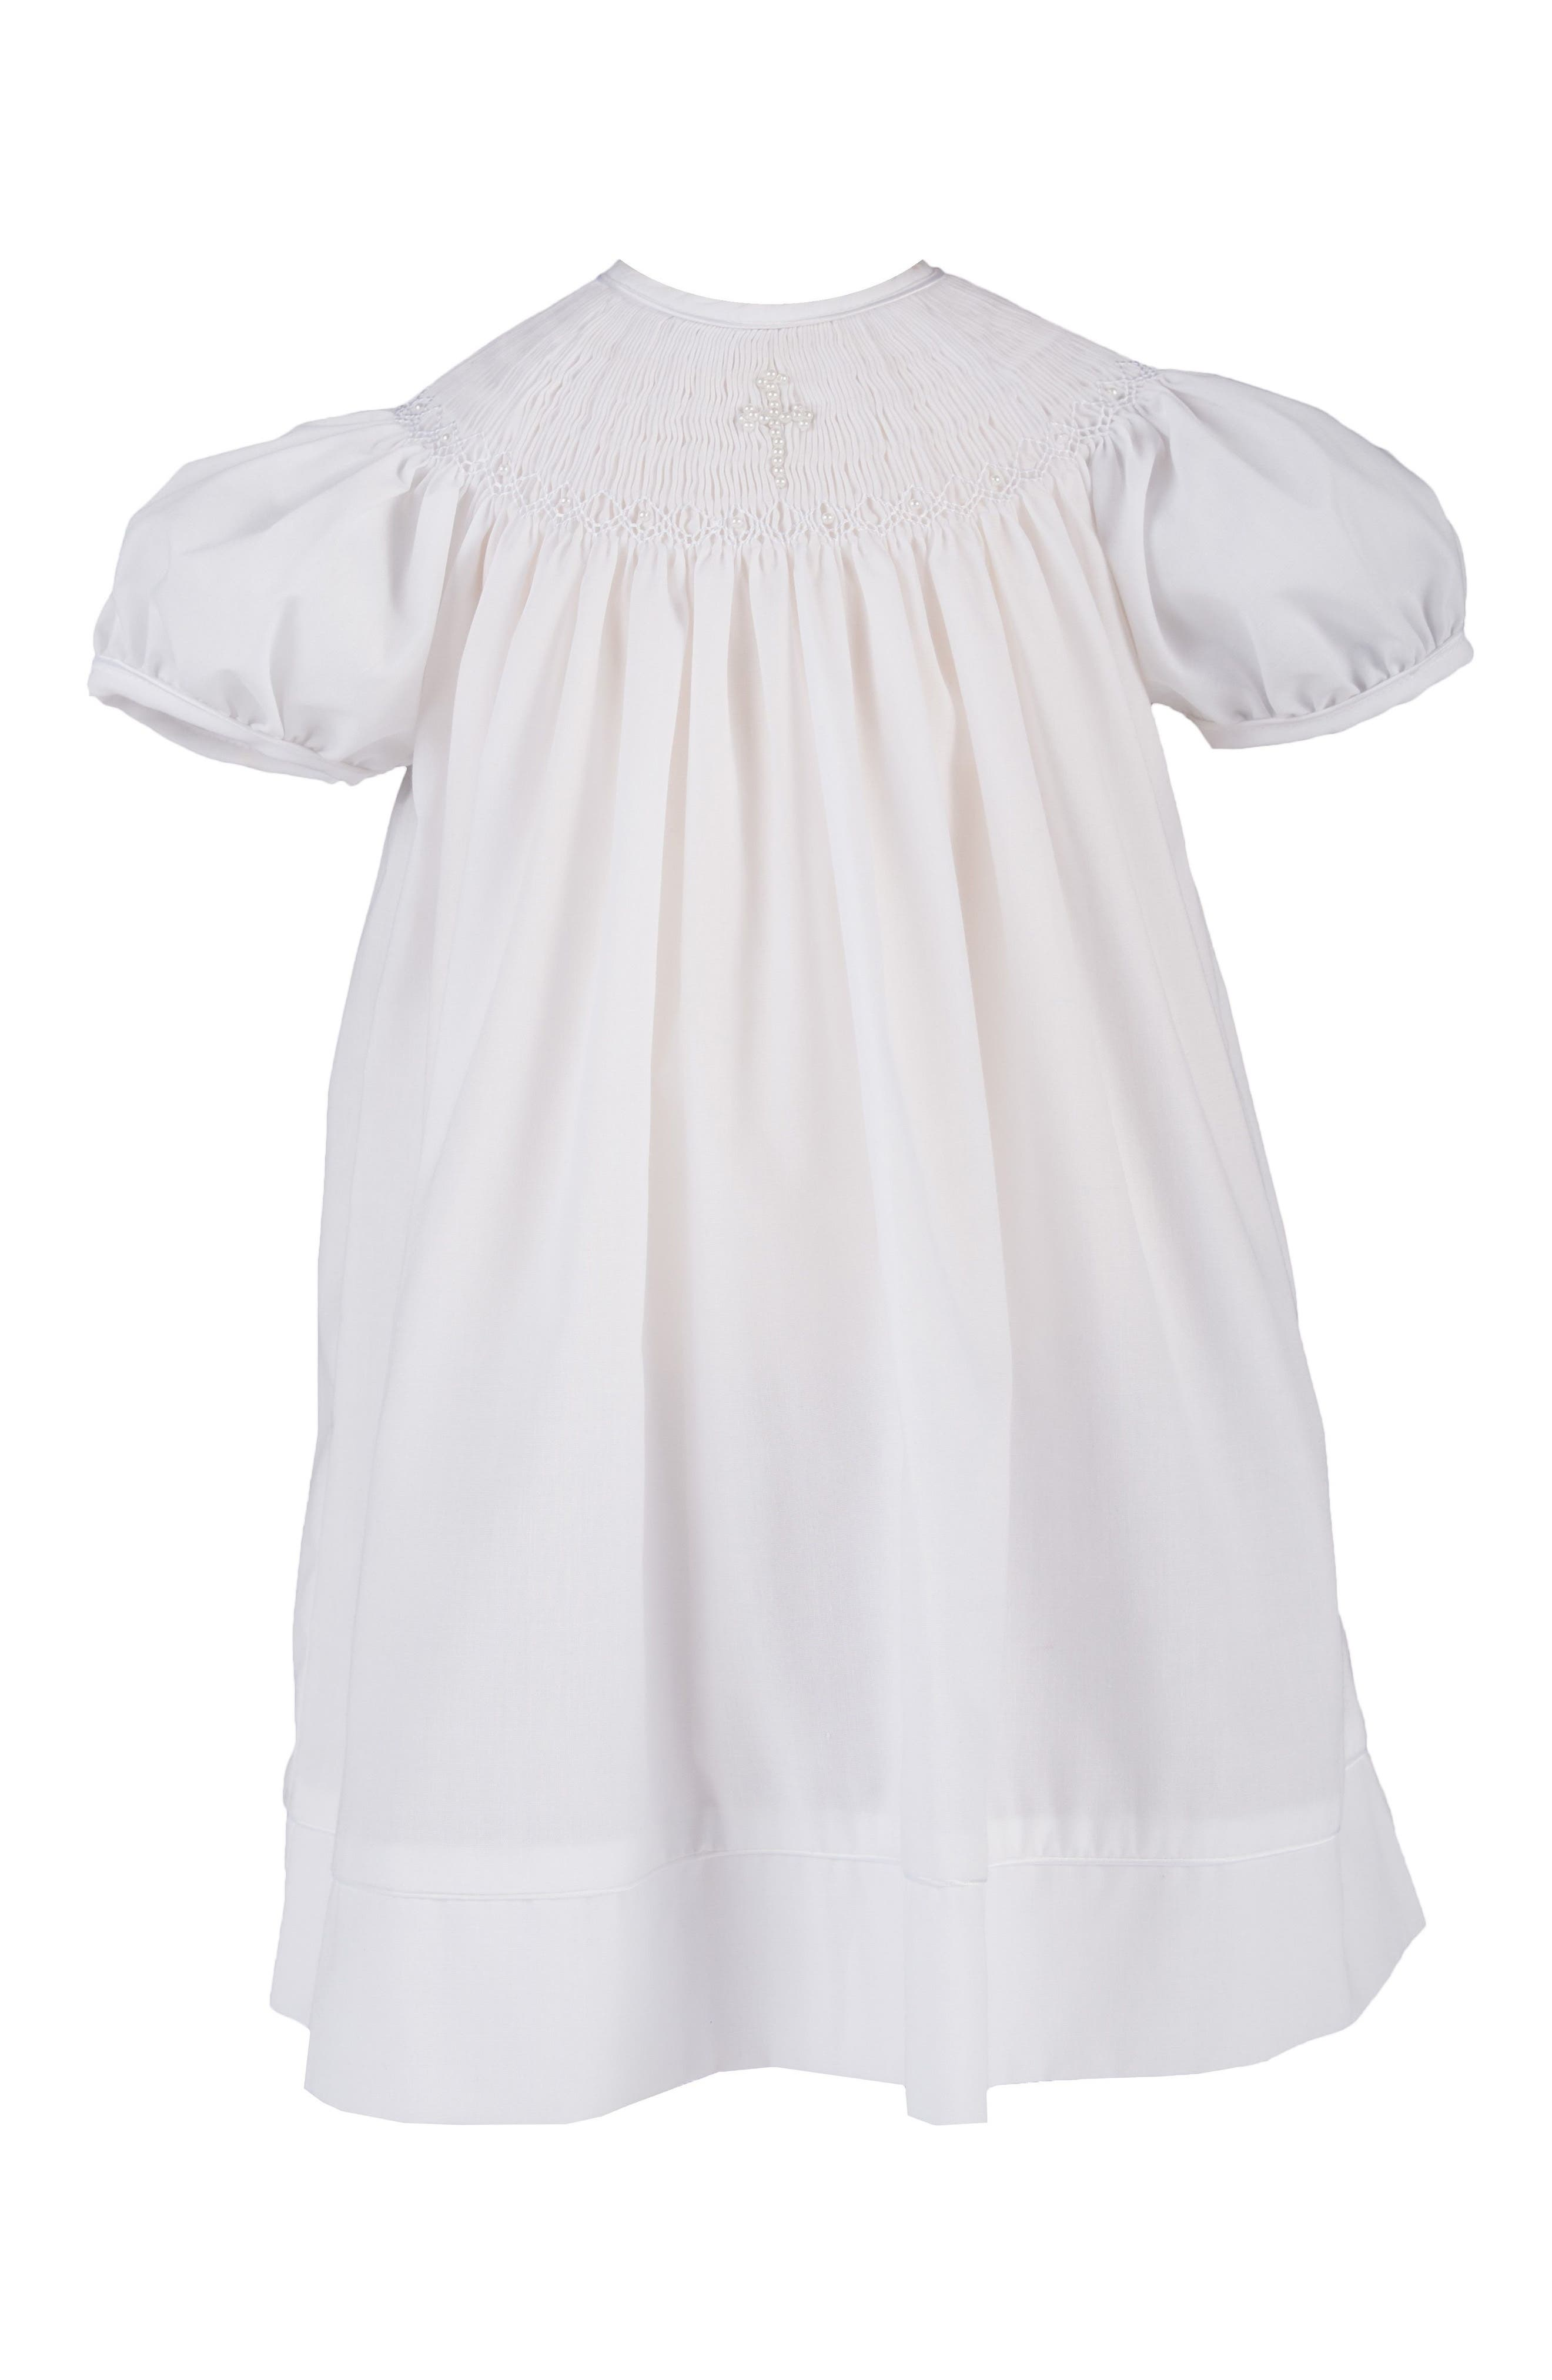 Imitation Pearl Cross Christening Gown & Bonnet Set,                             Alternate thumbnail 2, color,                             WHITE